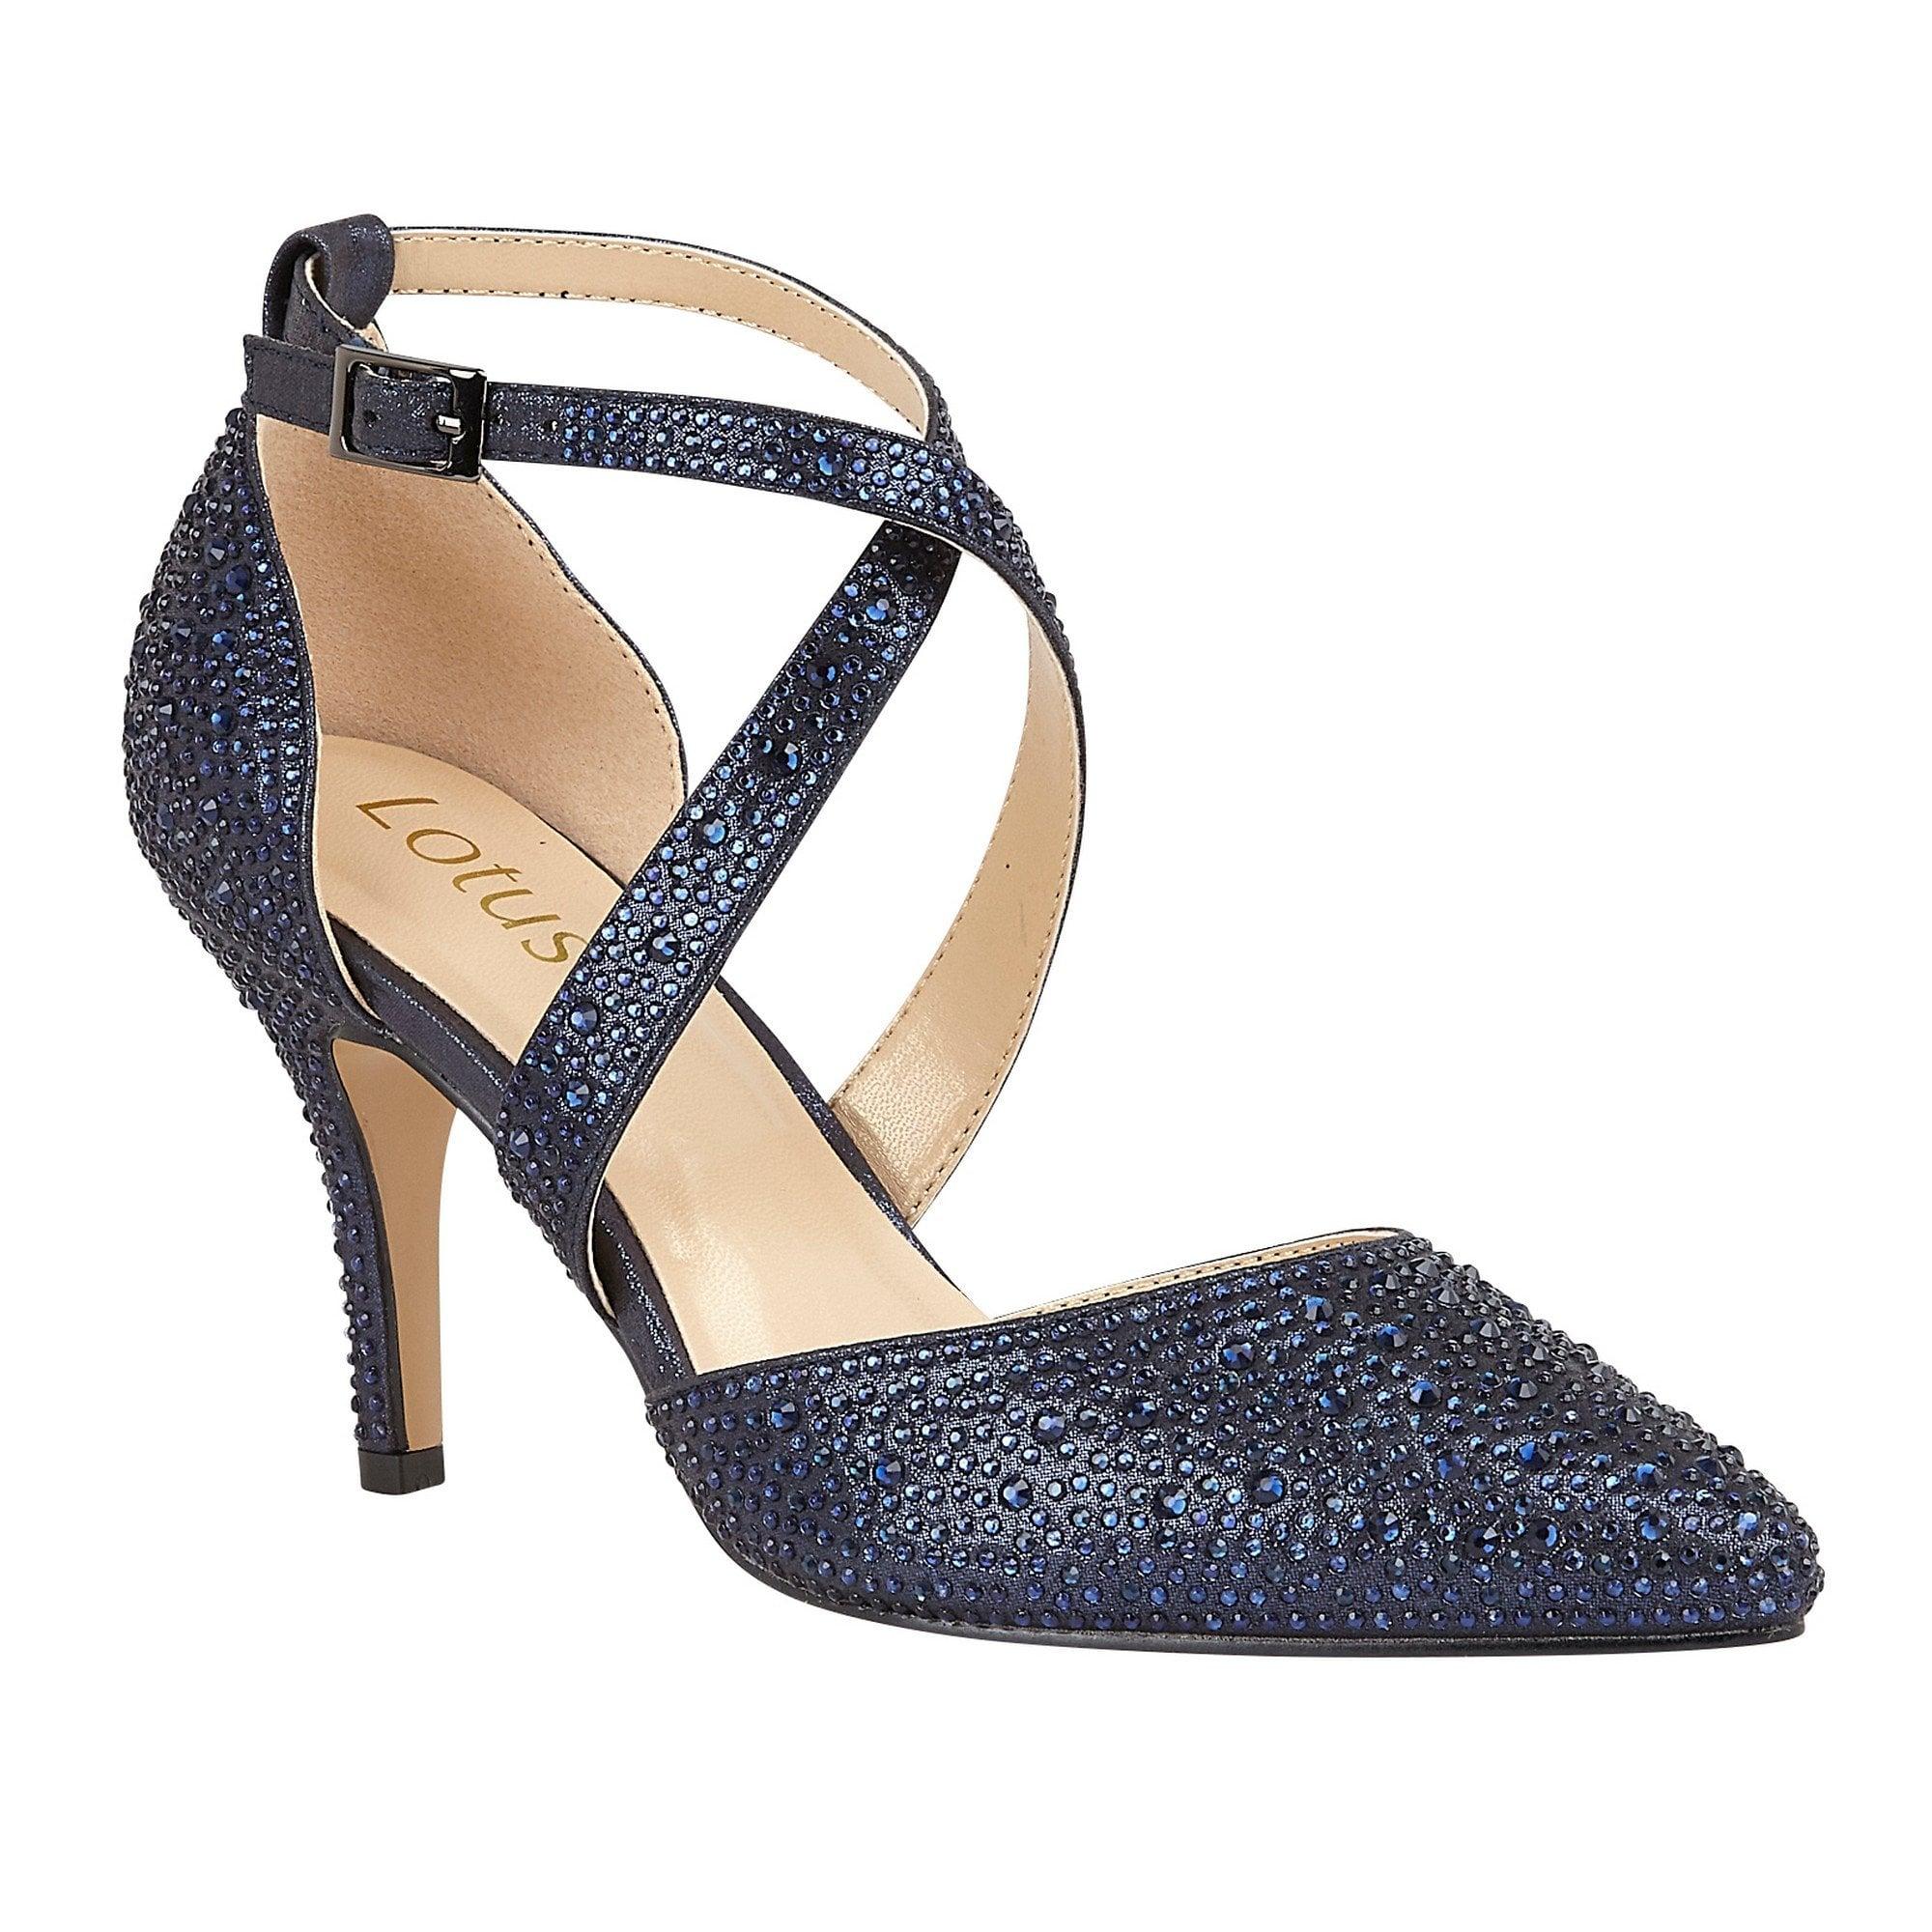 navy Lotus ladies' Star court shoes